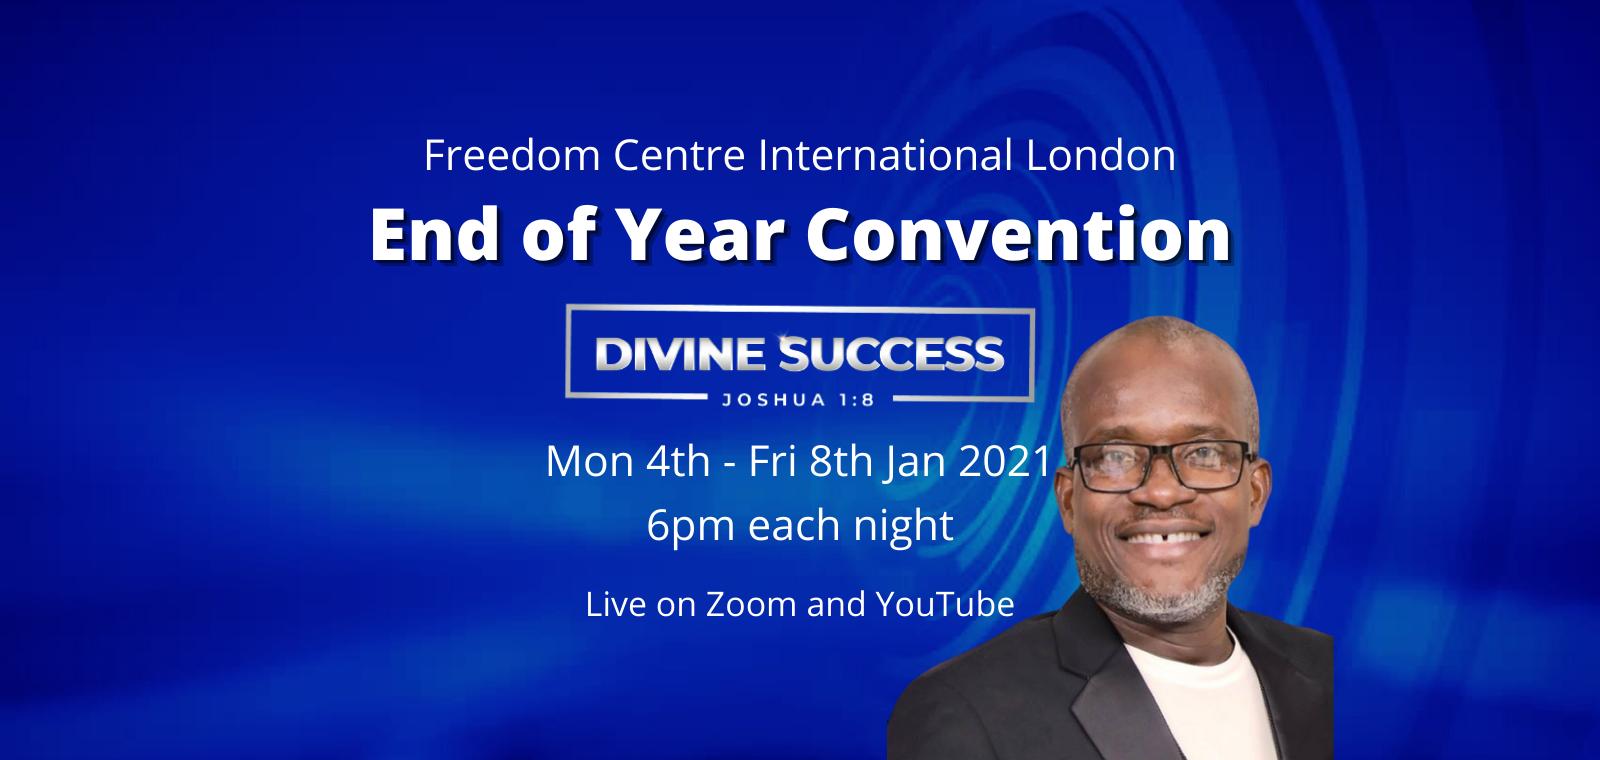 Freedom Centre International London